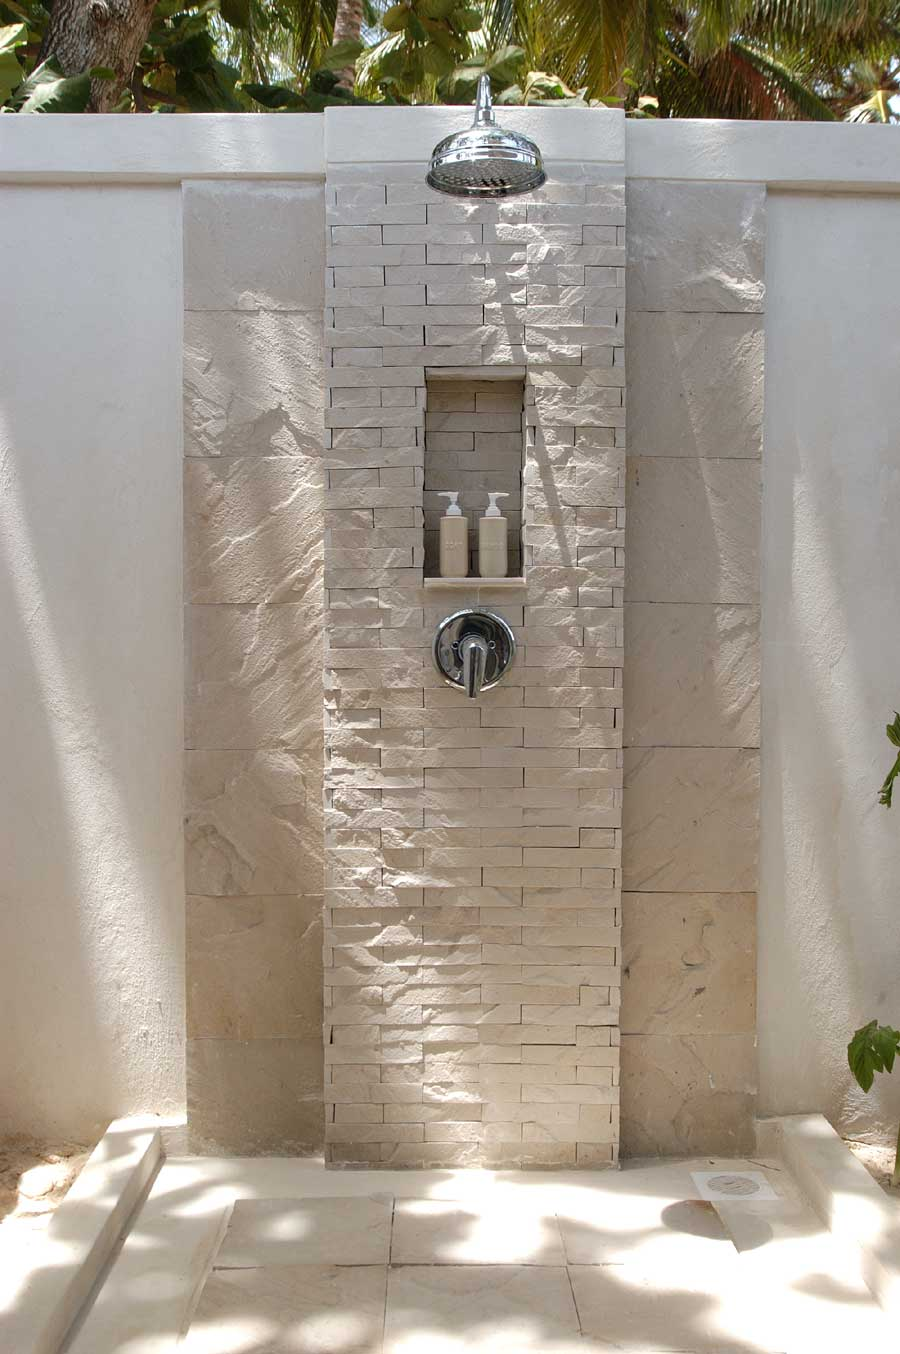 ... for beautiful homes photo credits houzz elle decor pinterest coté